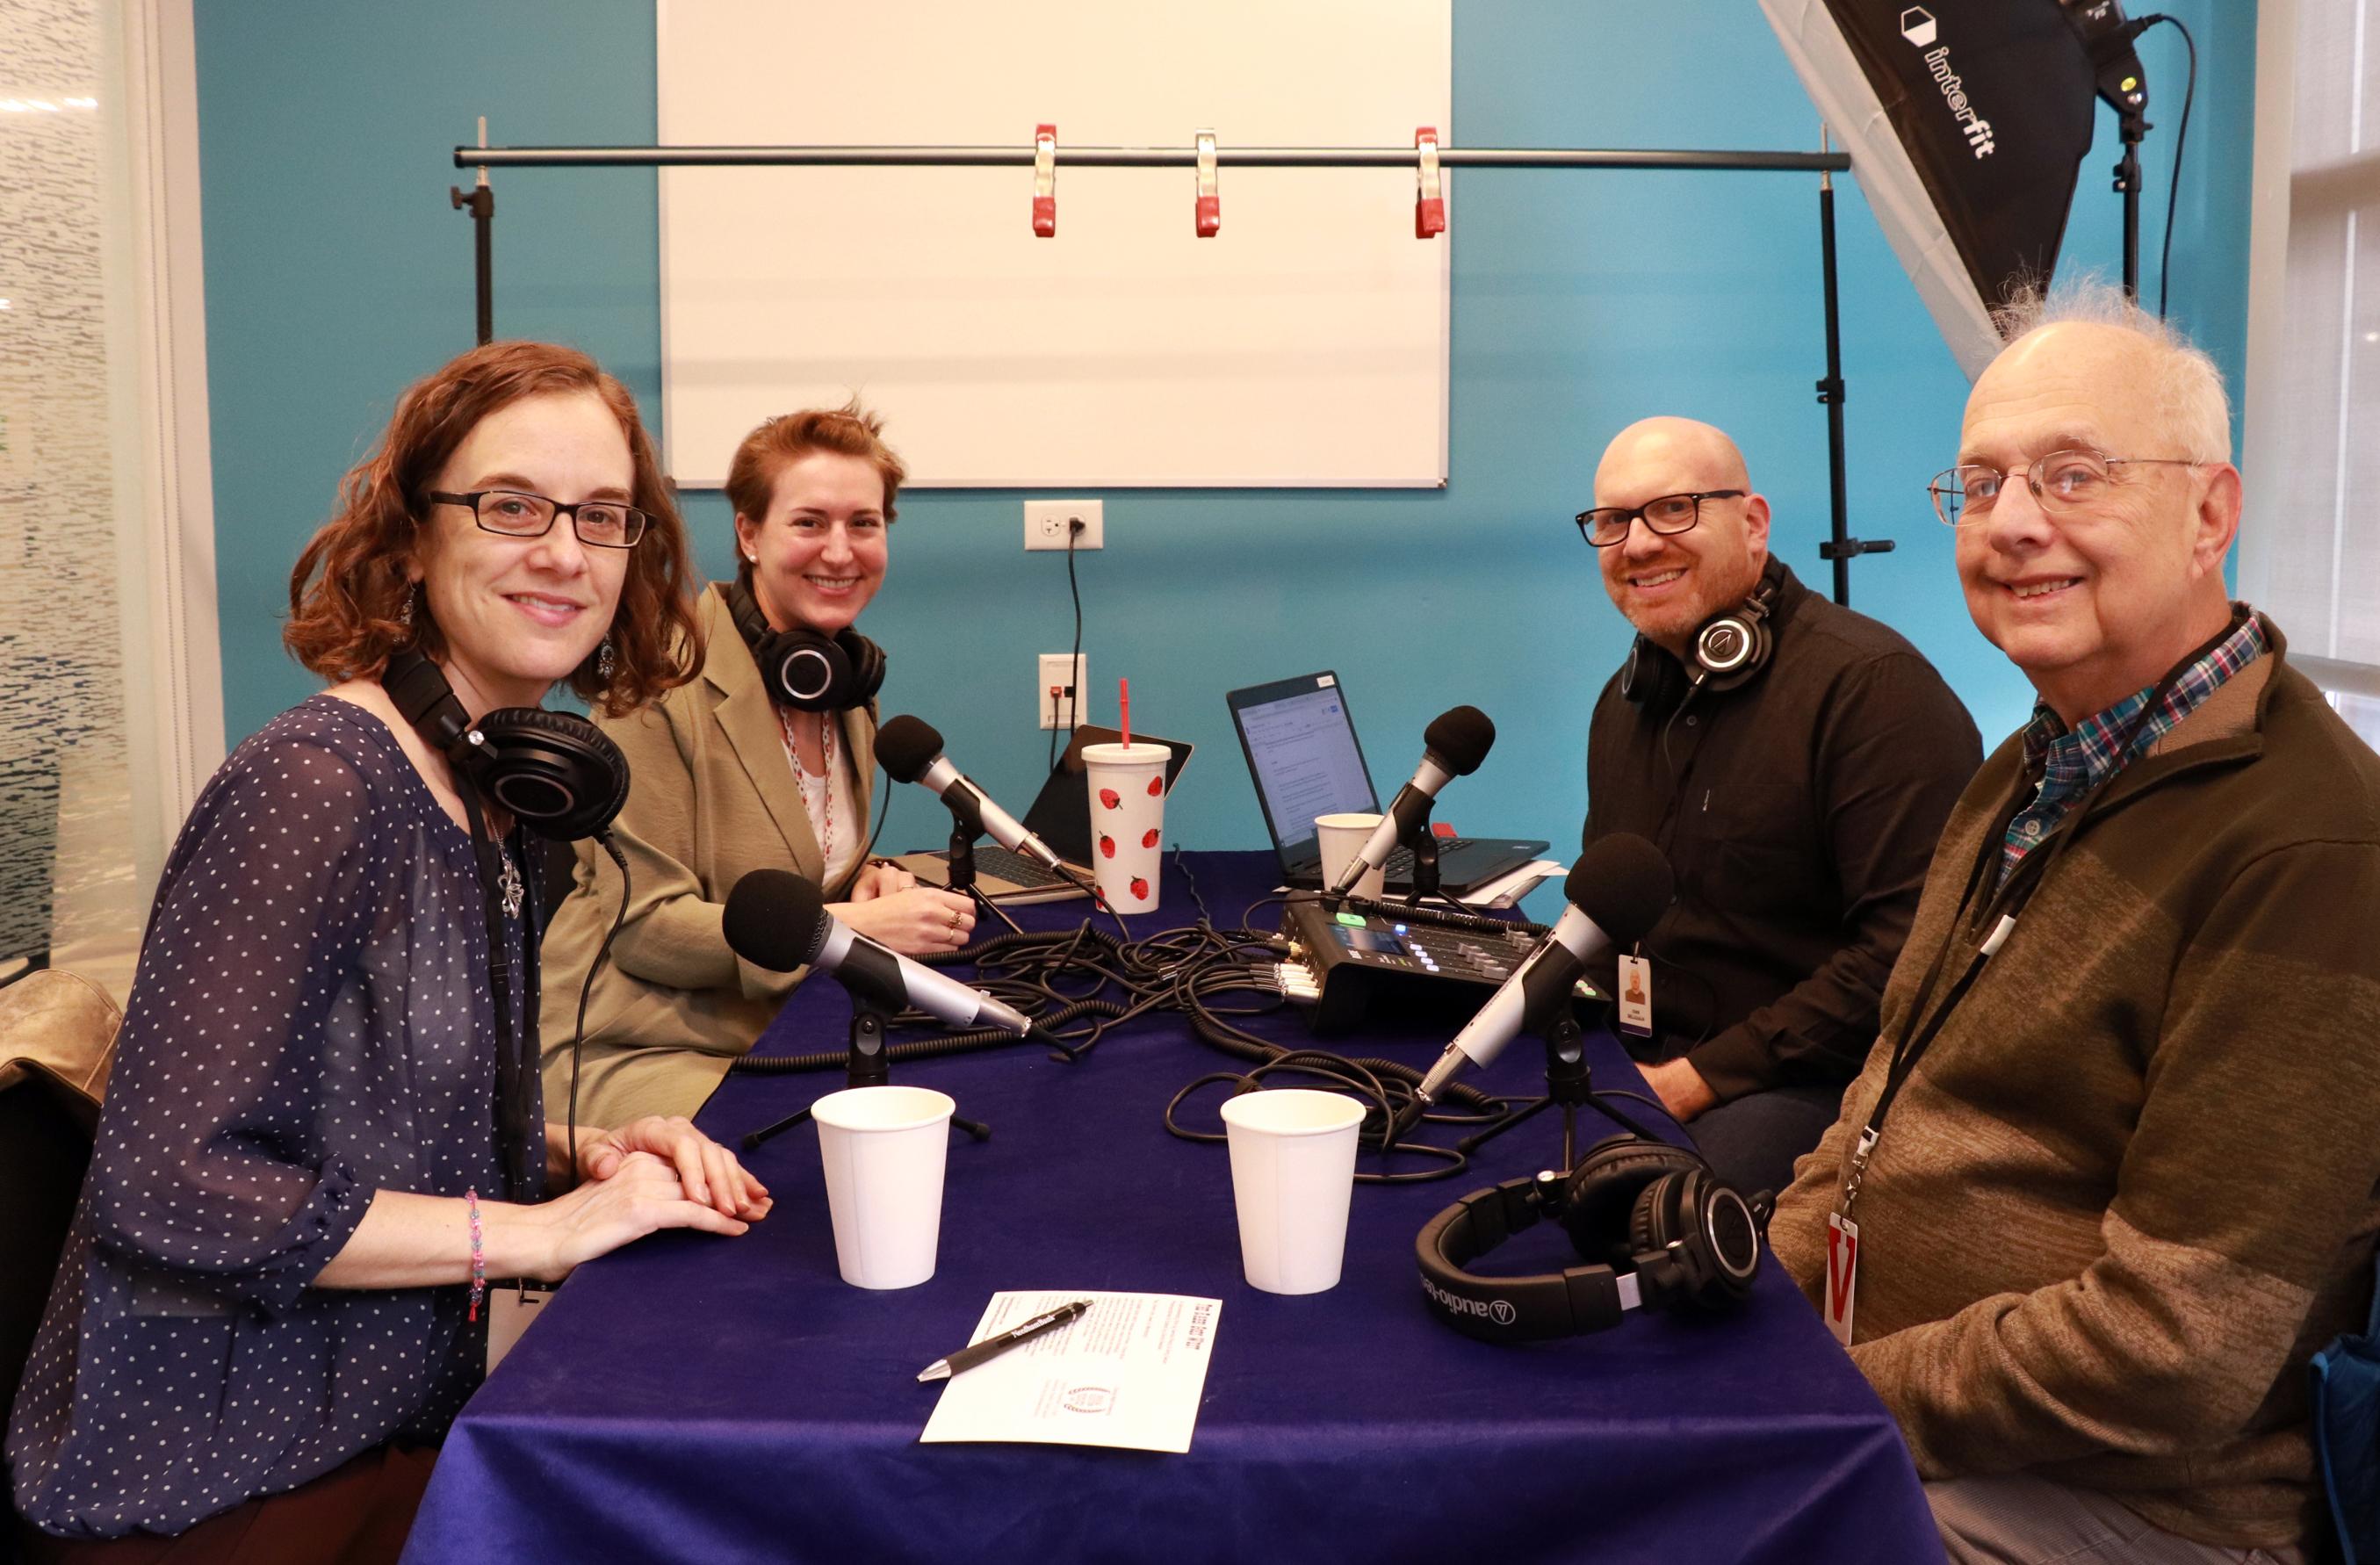 From left: Filmmaker Amy Geller, Kali Foxman, Dan Seligson and filmmaker Gerald Peary (Photo: Ashley Jacobs)